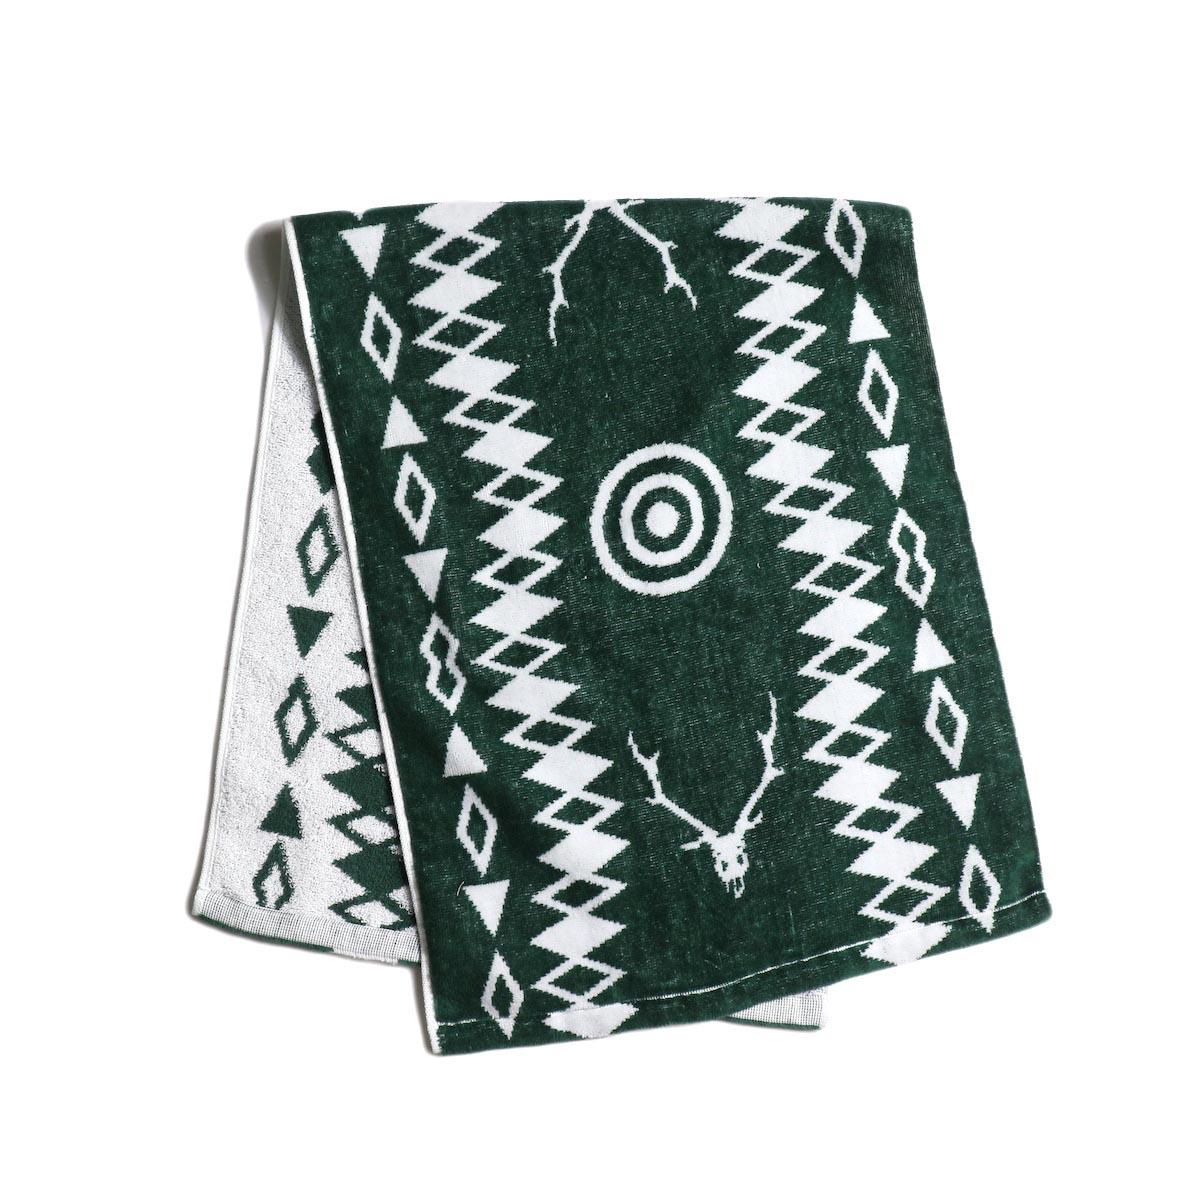 South2 West8 / Face Towel -Cotton Jacquard (Target & Skull)